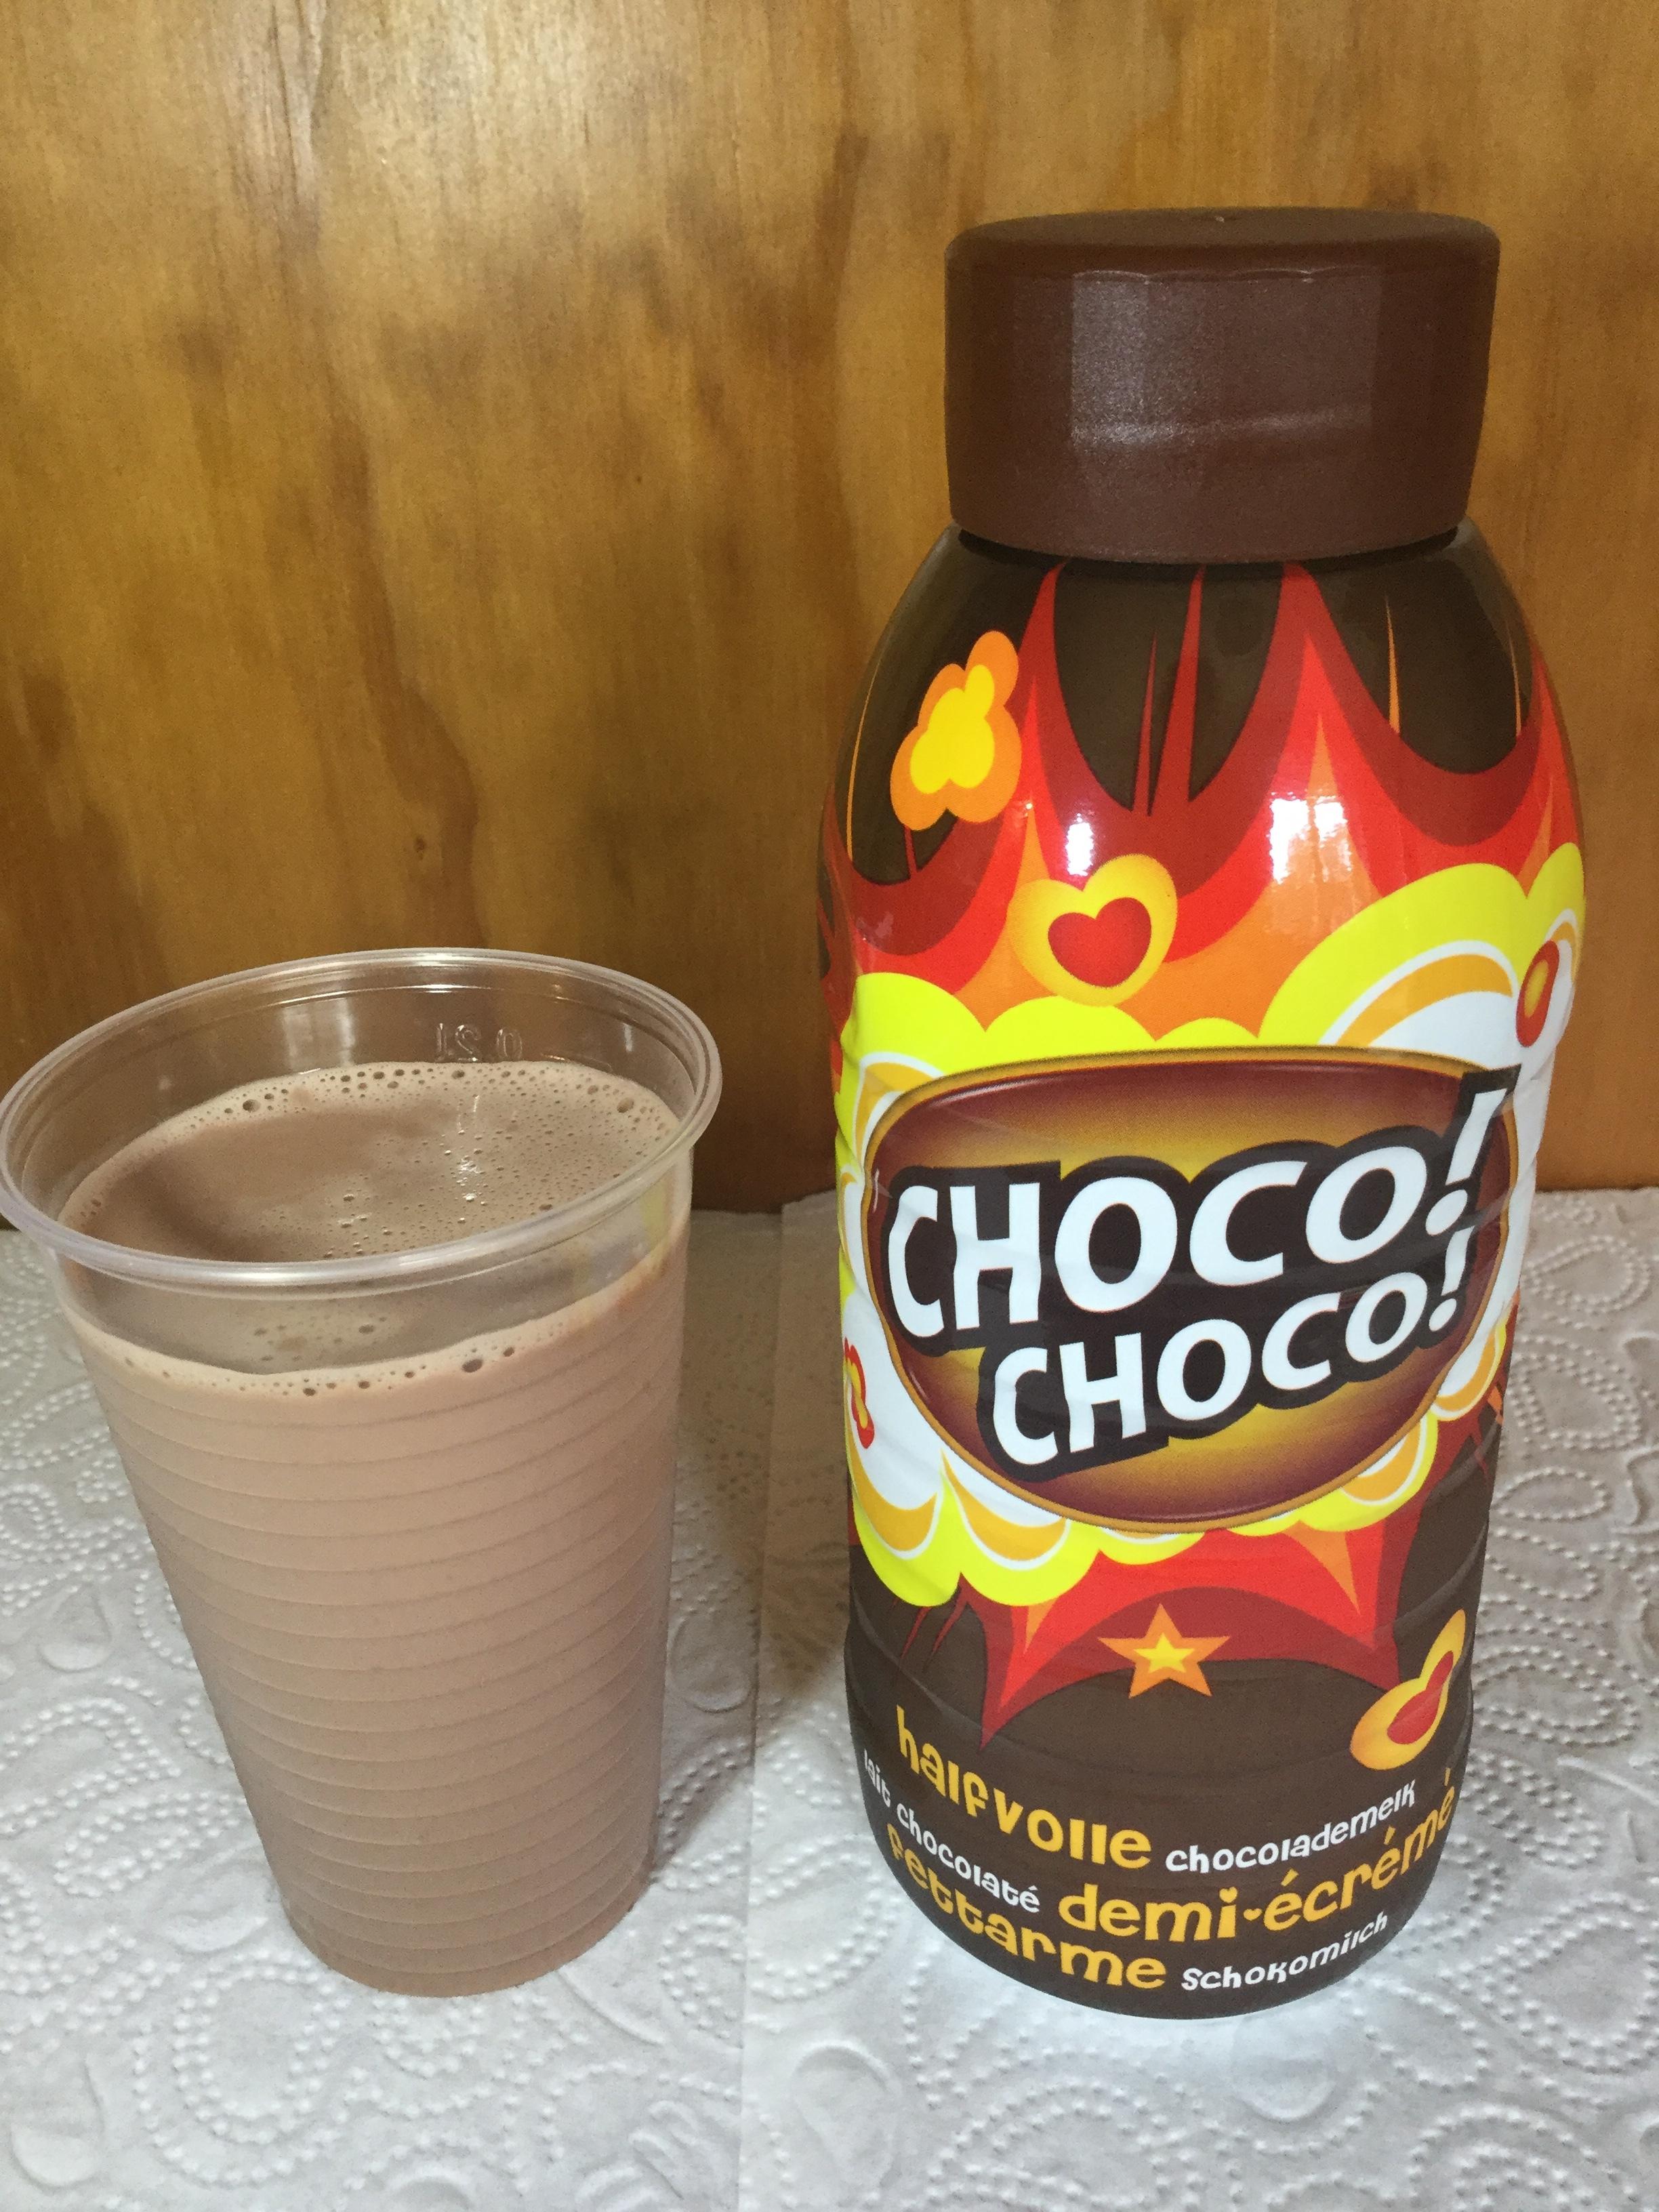 Milcobel Choco! Choco! Cup